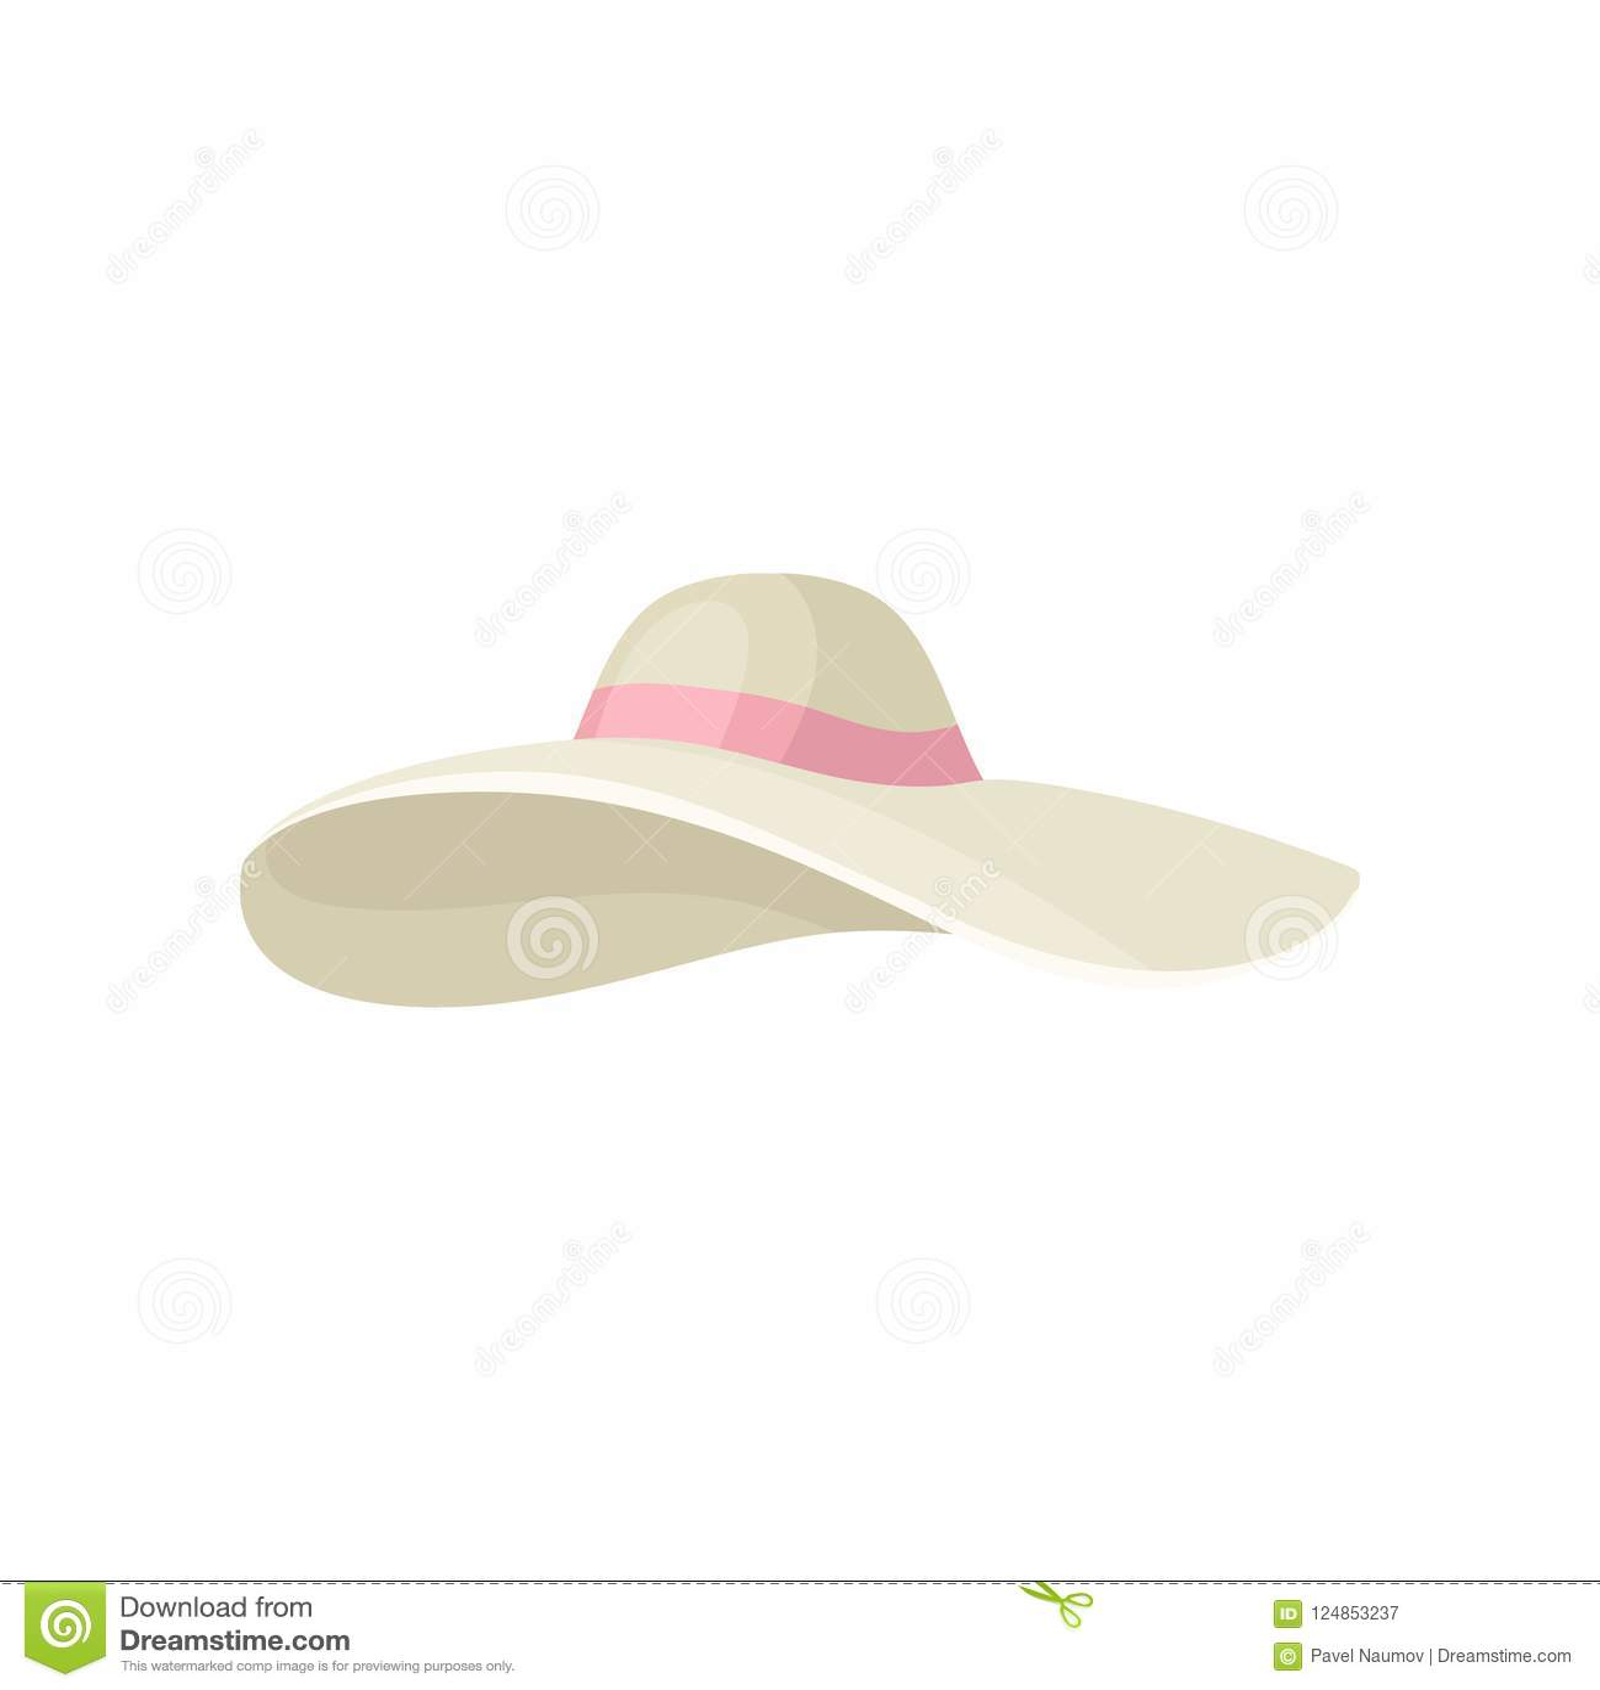 9bfbde0541a Elegant beige women s hat with pink ribbon. Stylish female headwear. Trendy  summer accessory